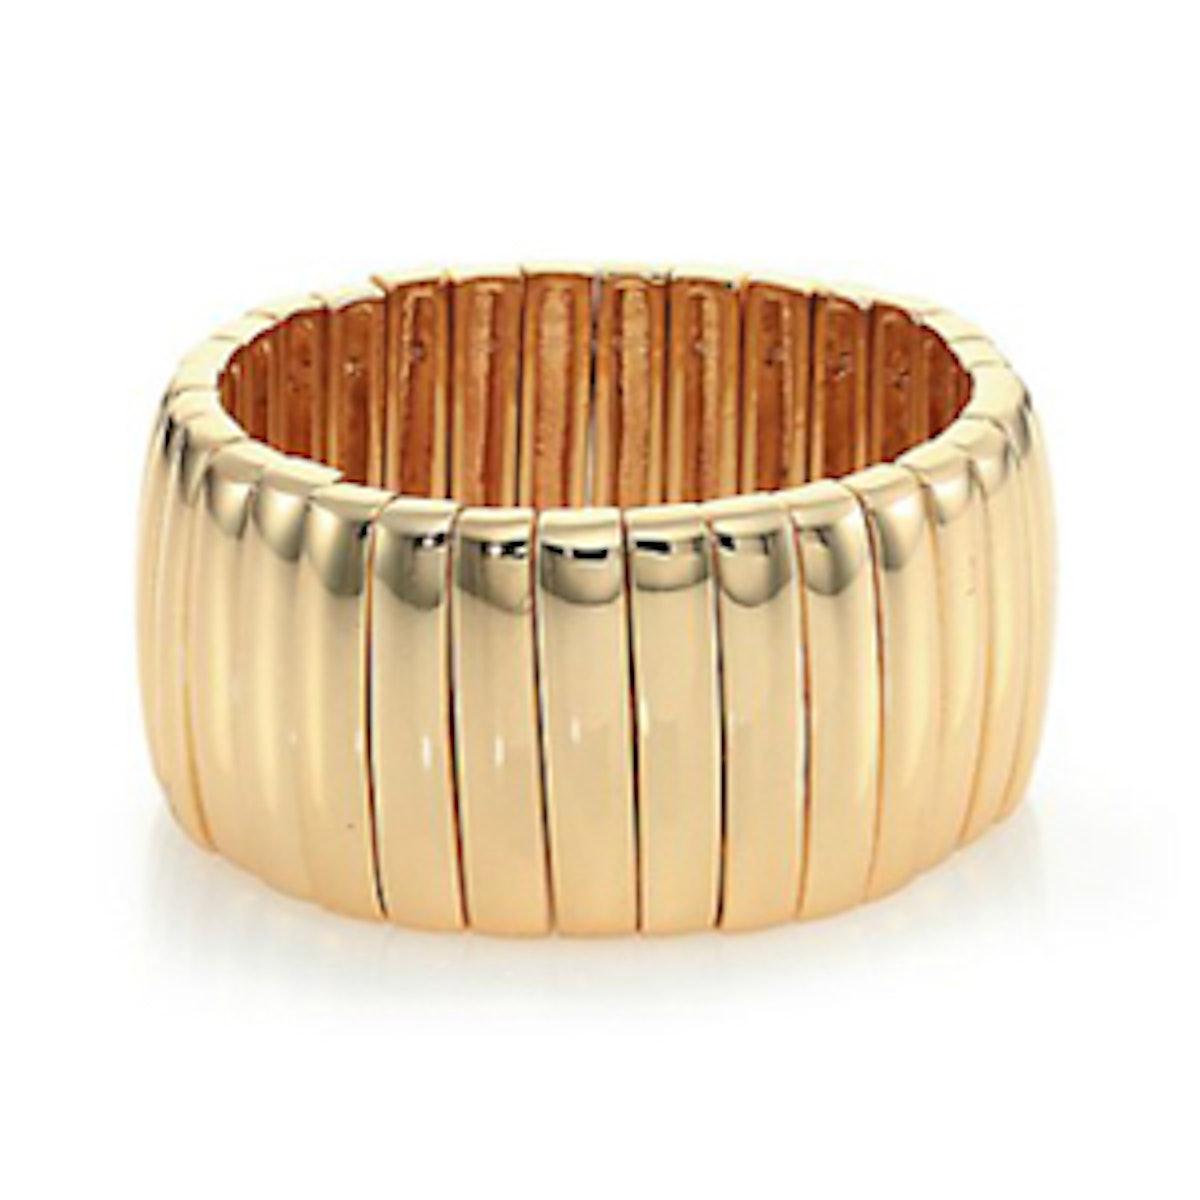 Seaglass Brights Bar Cuff Bracelet